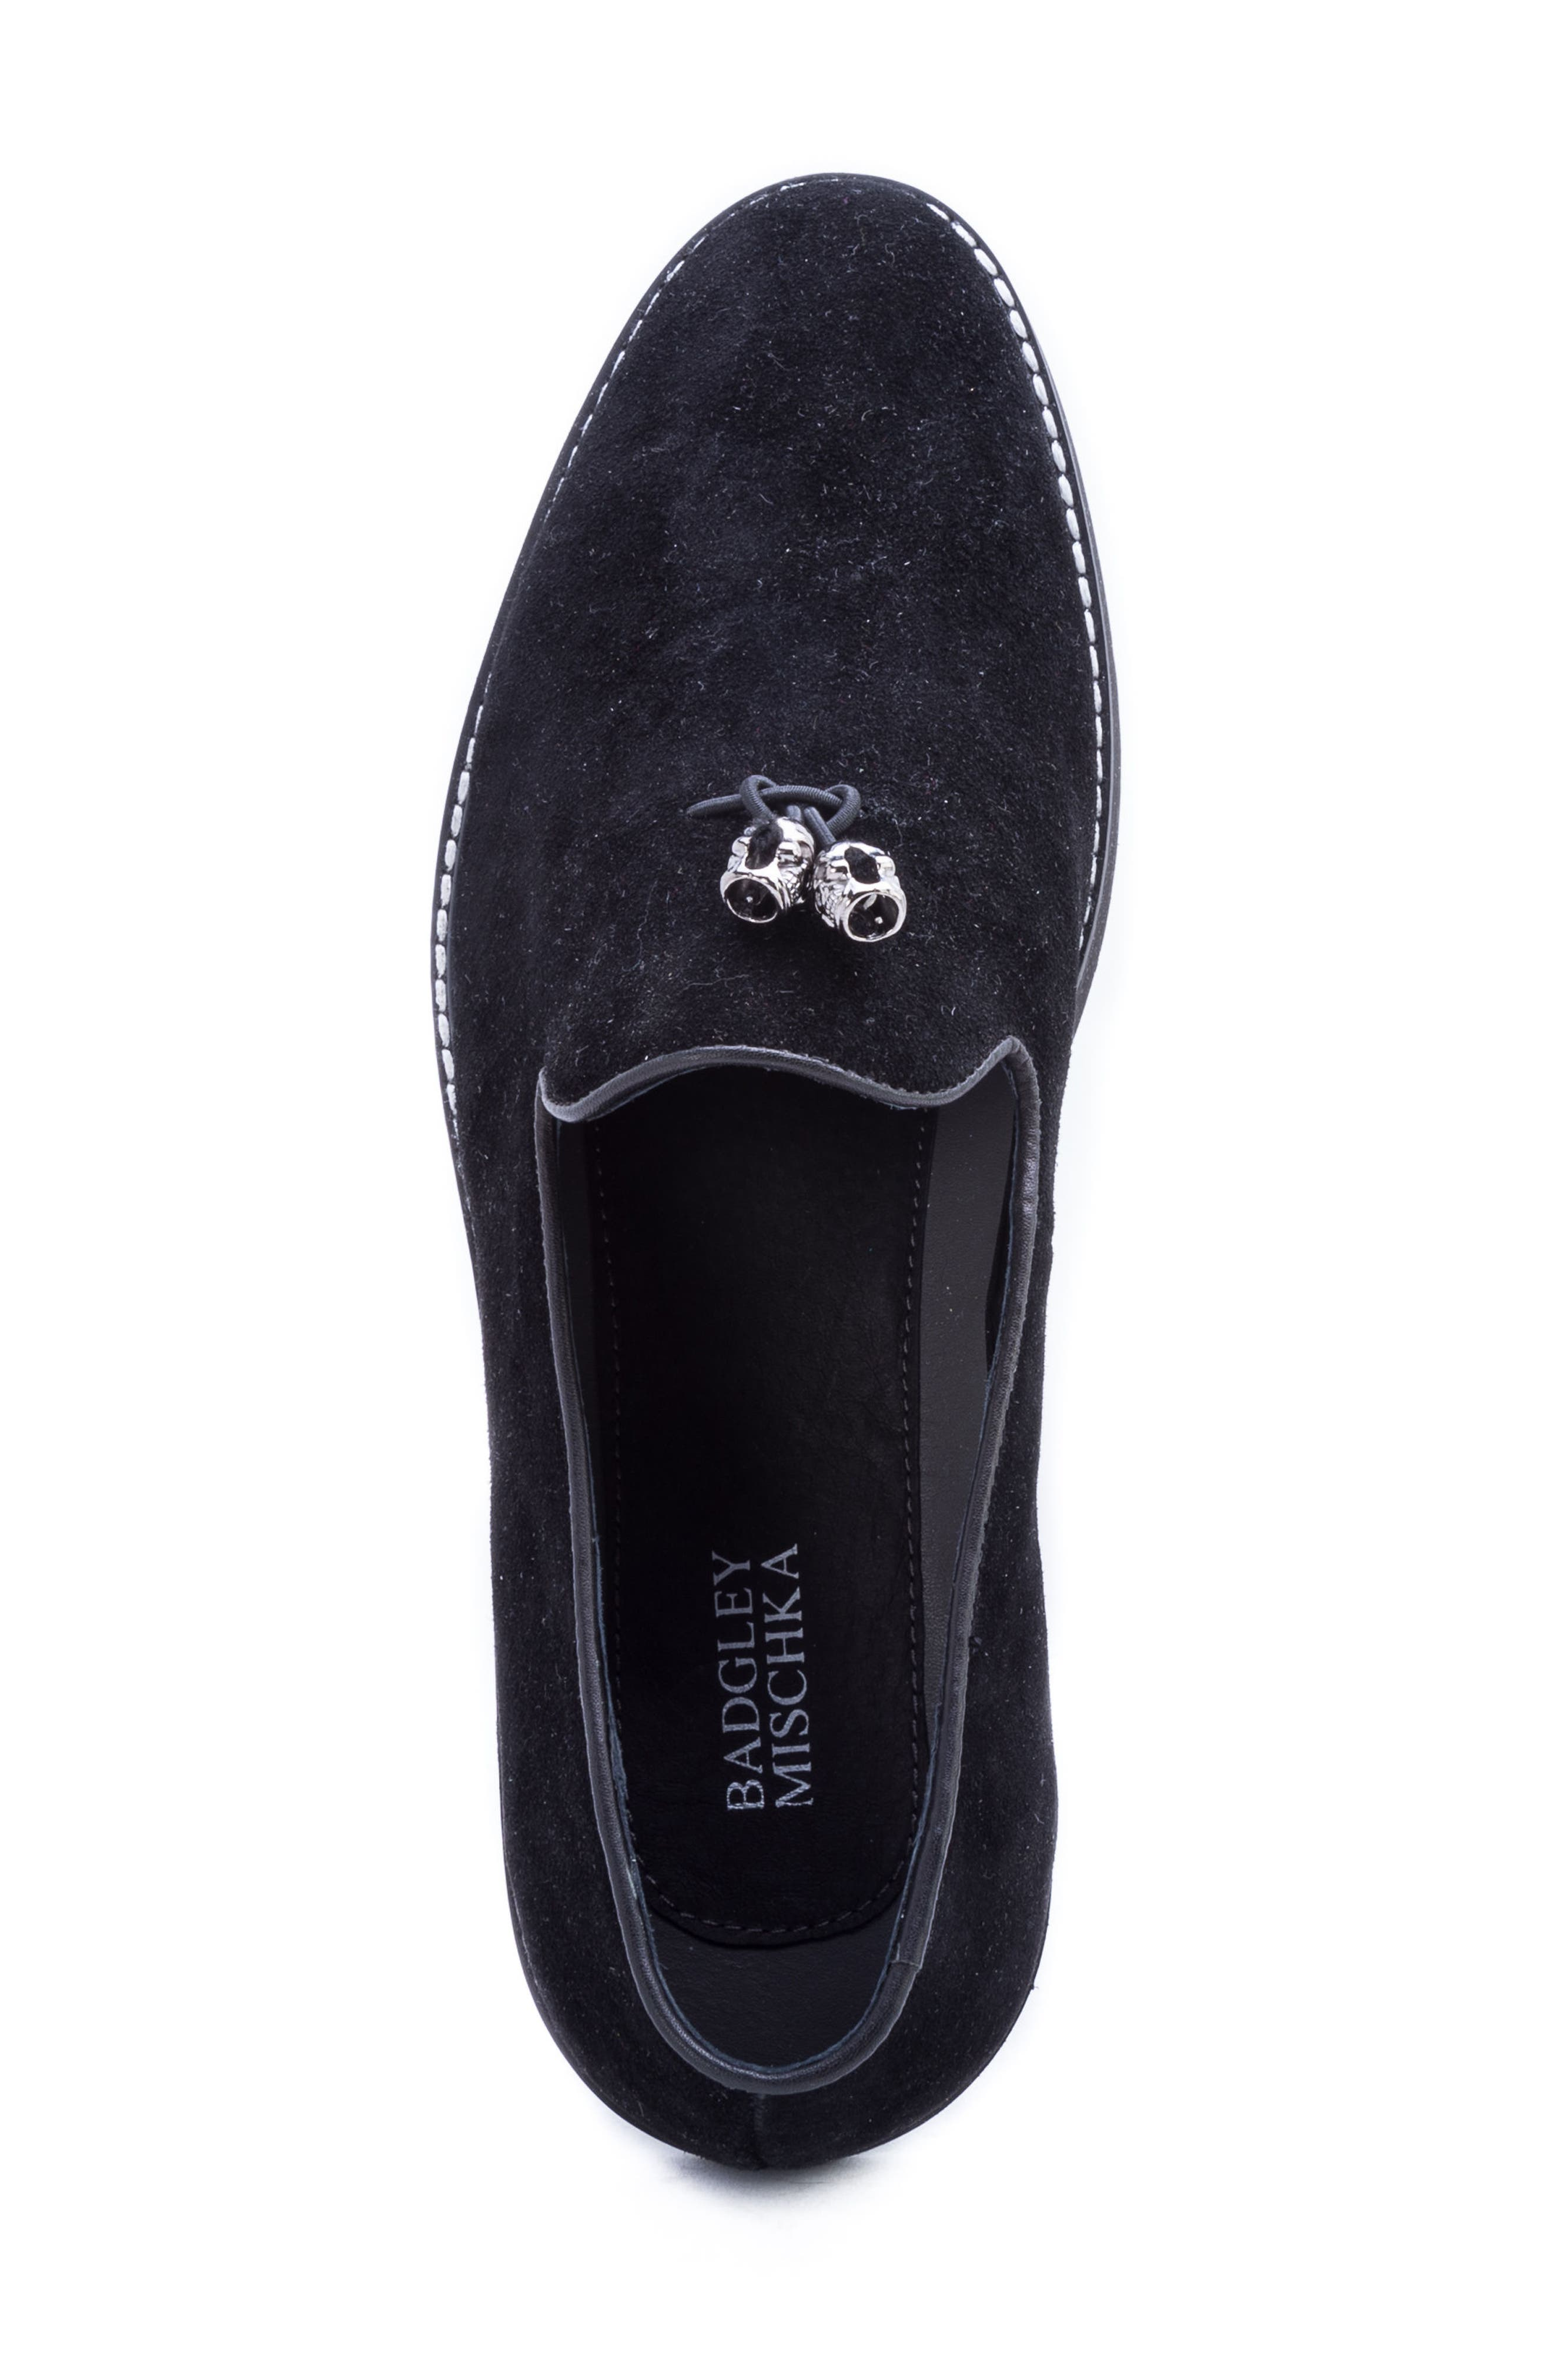 Badgley Mischka Heston Tassel Loafer,                             Alternate thumbnail 5, color,                             BLACK SUEDE